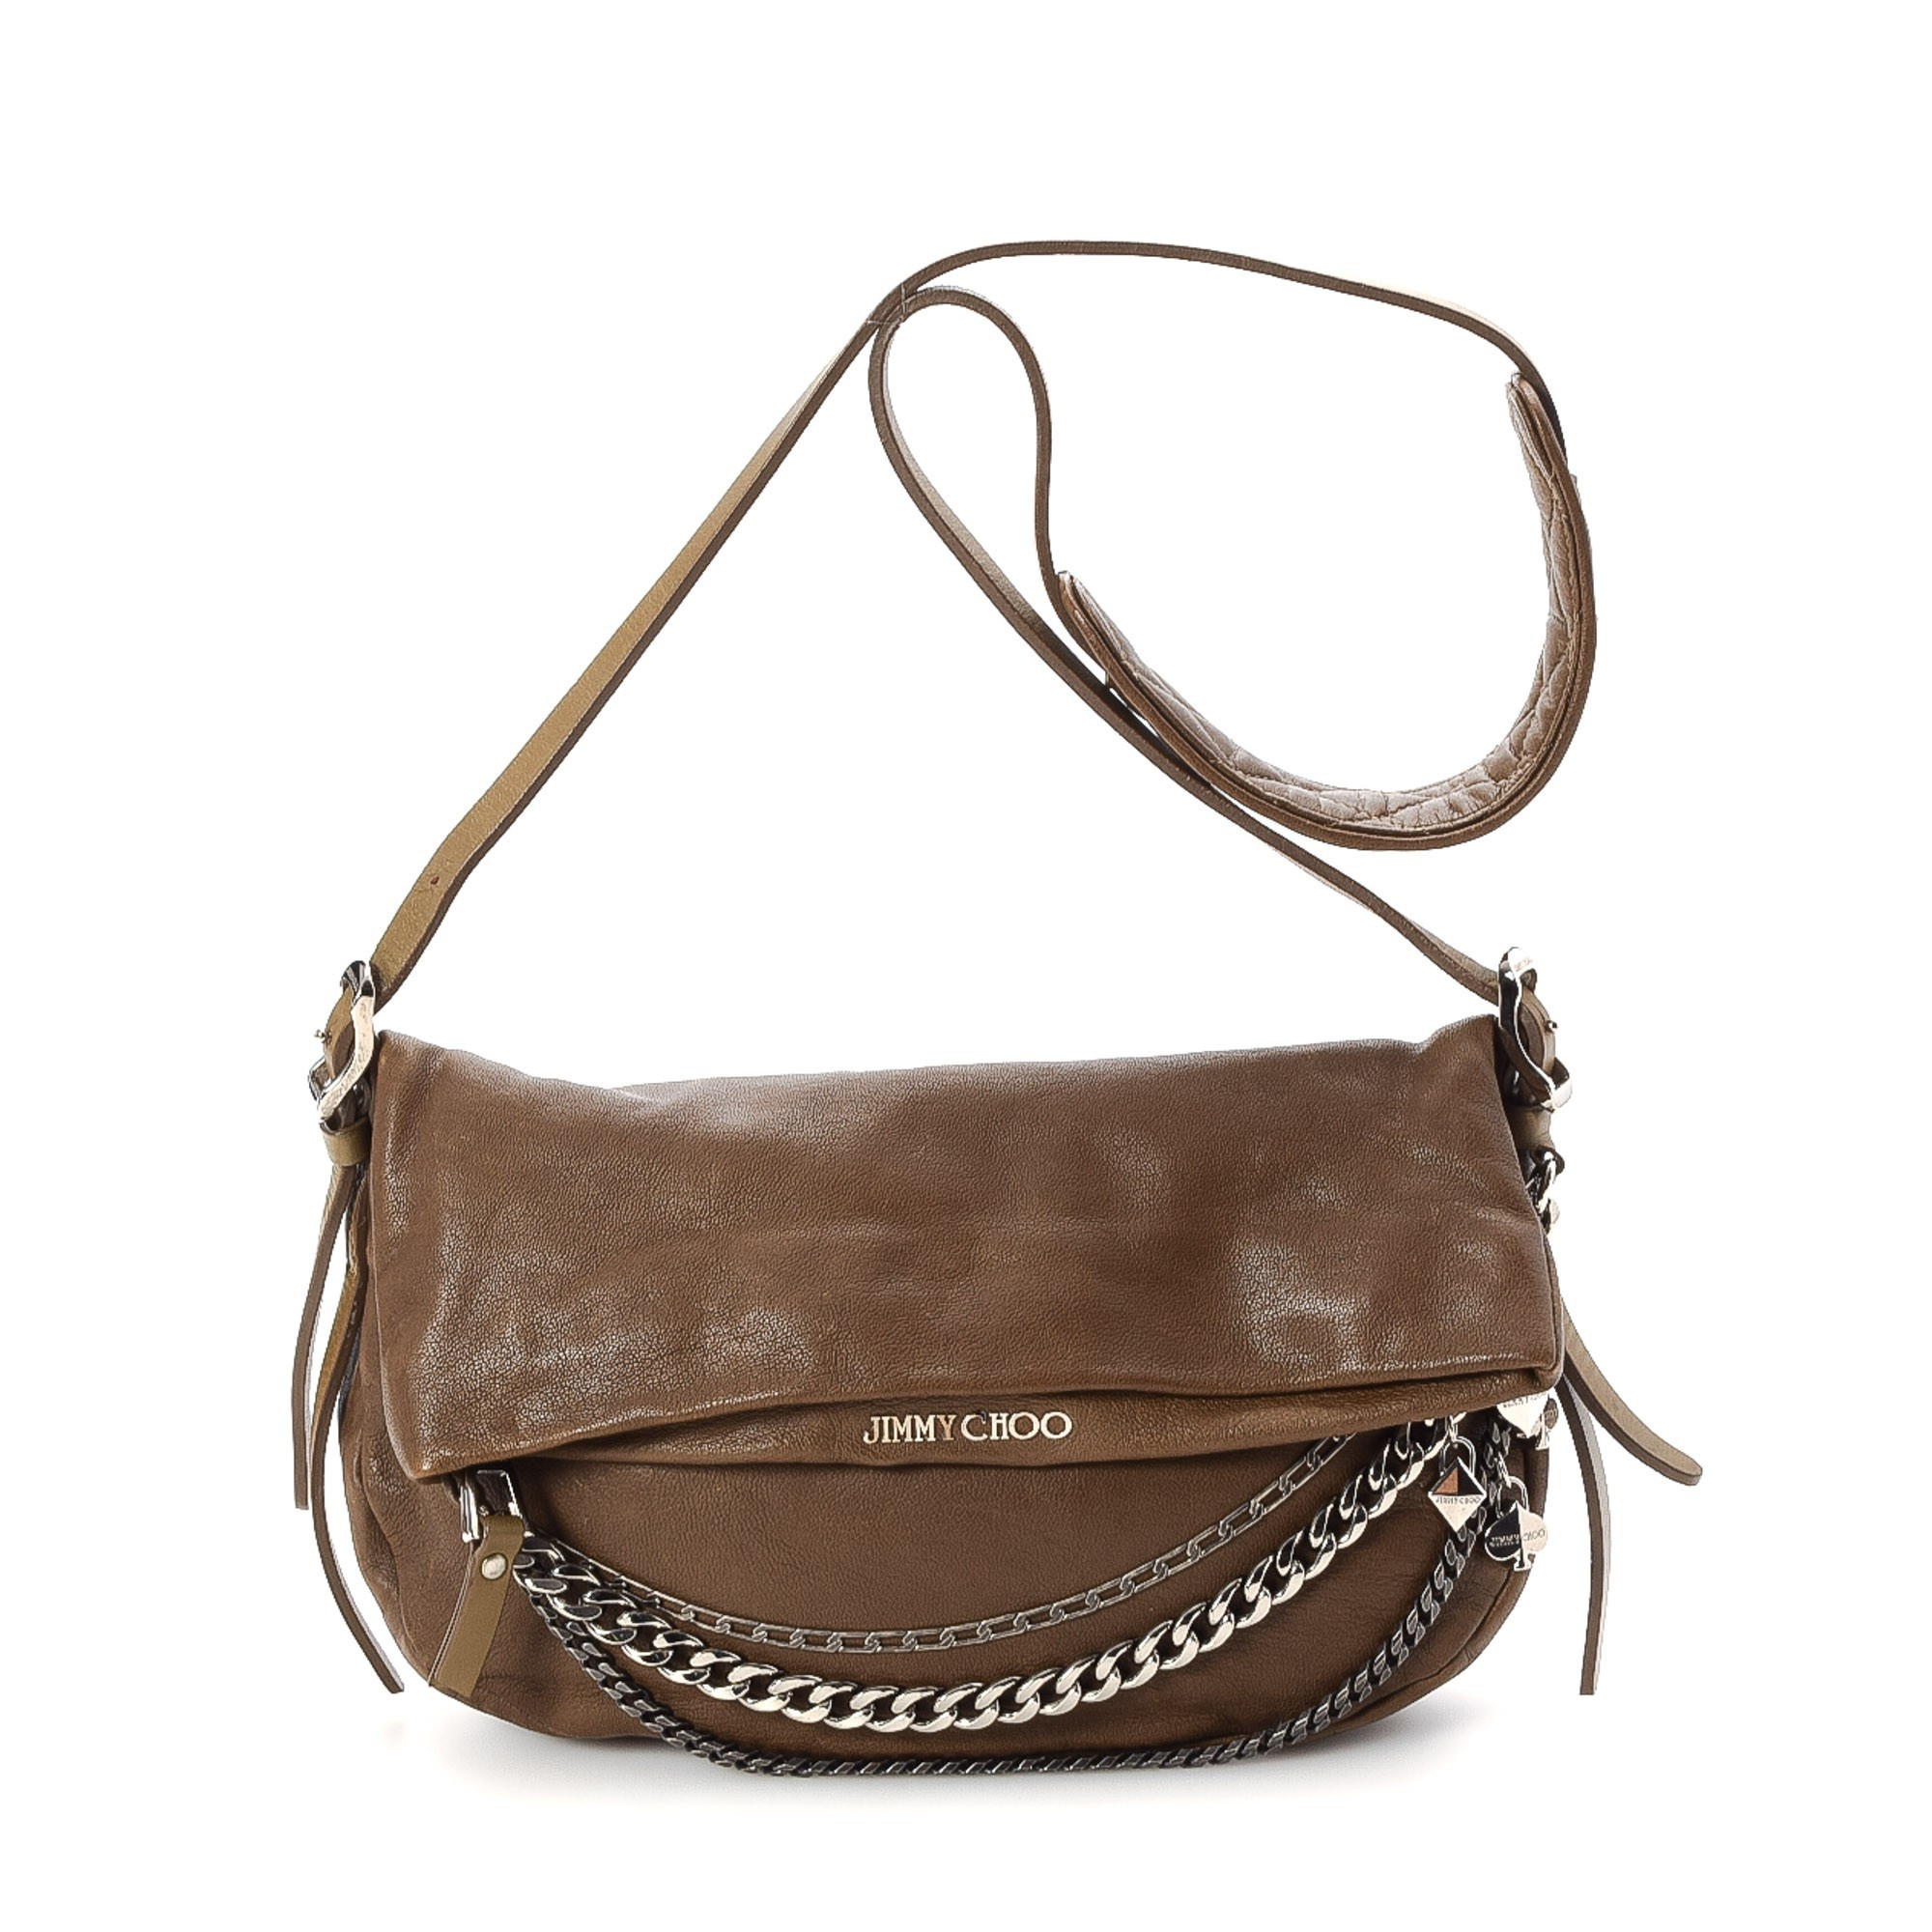 Buy Brown Leather Jimmy Choo Messenger & Crossbody Bag at ...